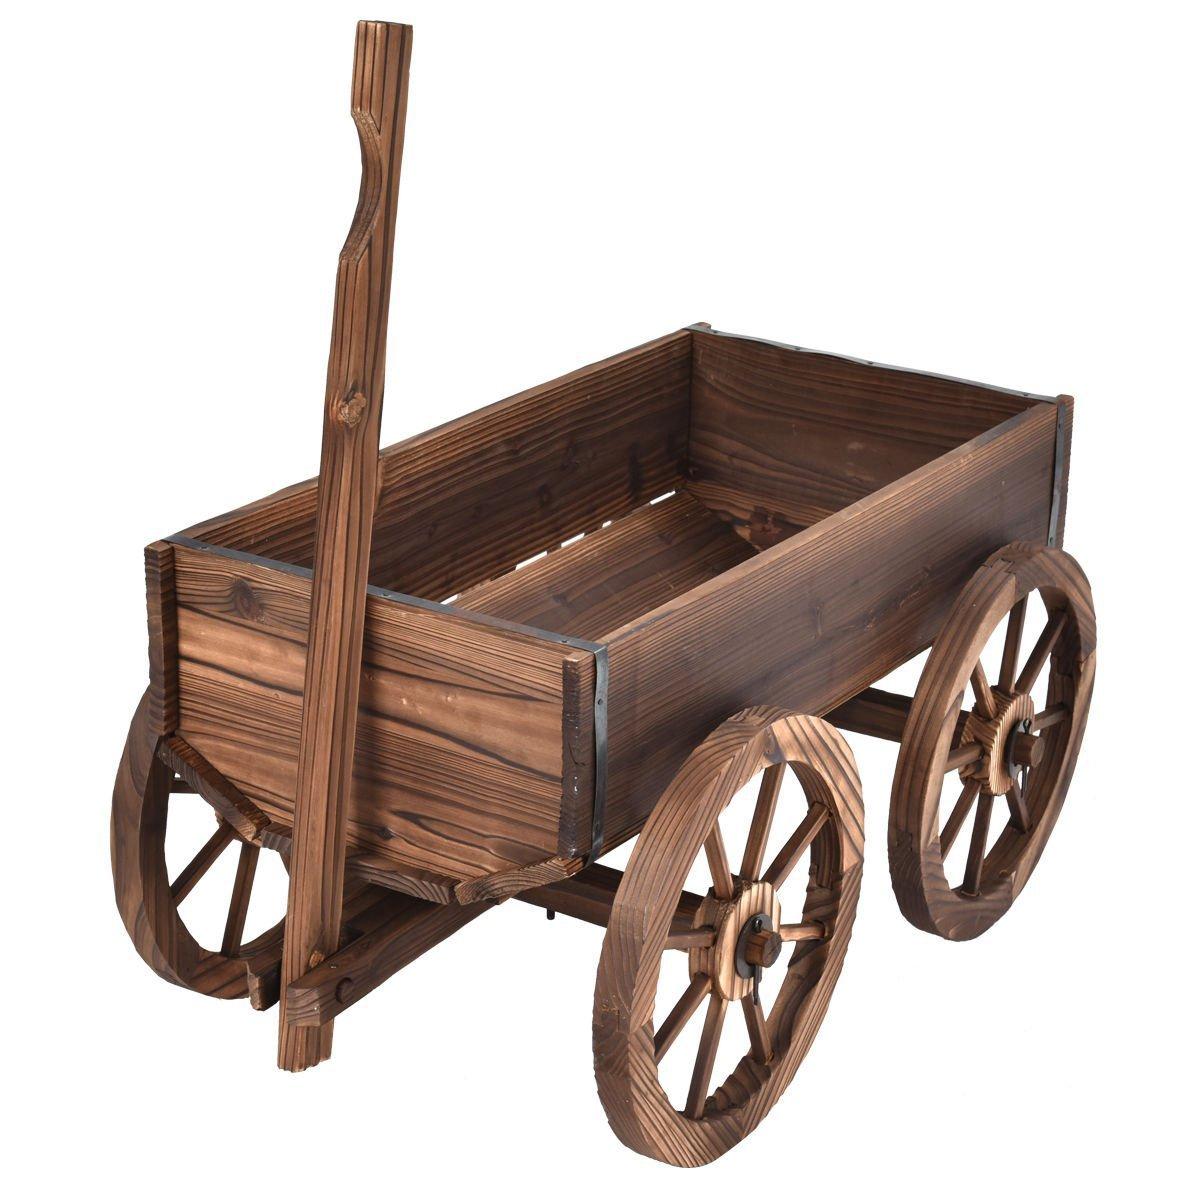 Amazon.com : Giantex Wood Wagon Flower Planter Pot Stand W/Wheels ...